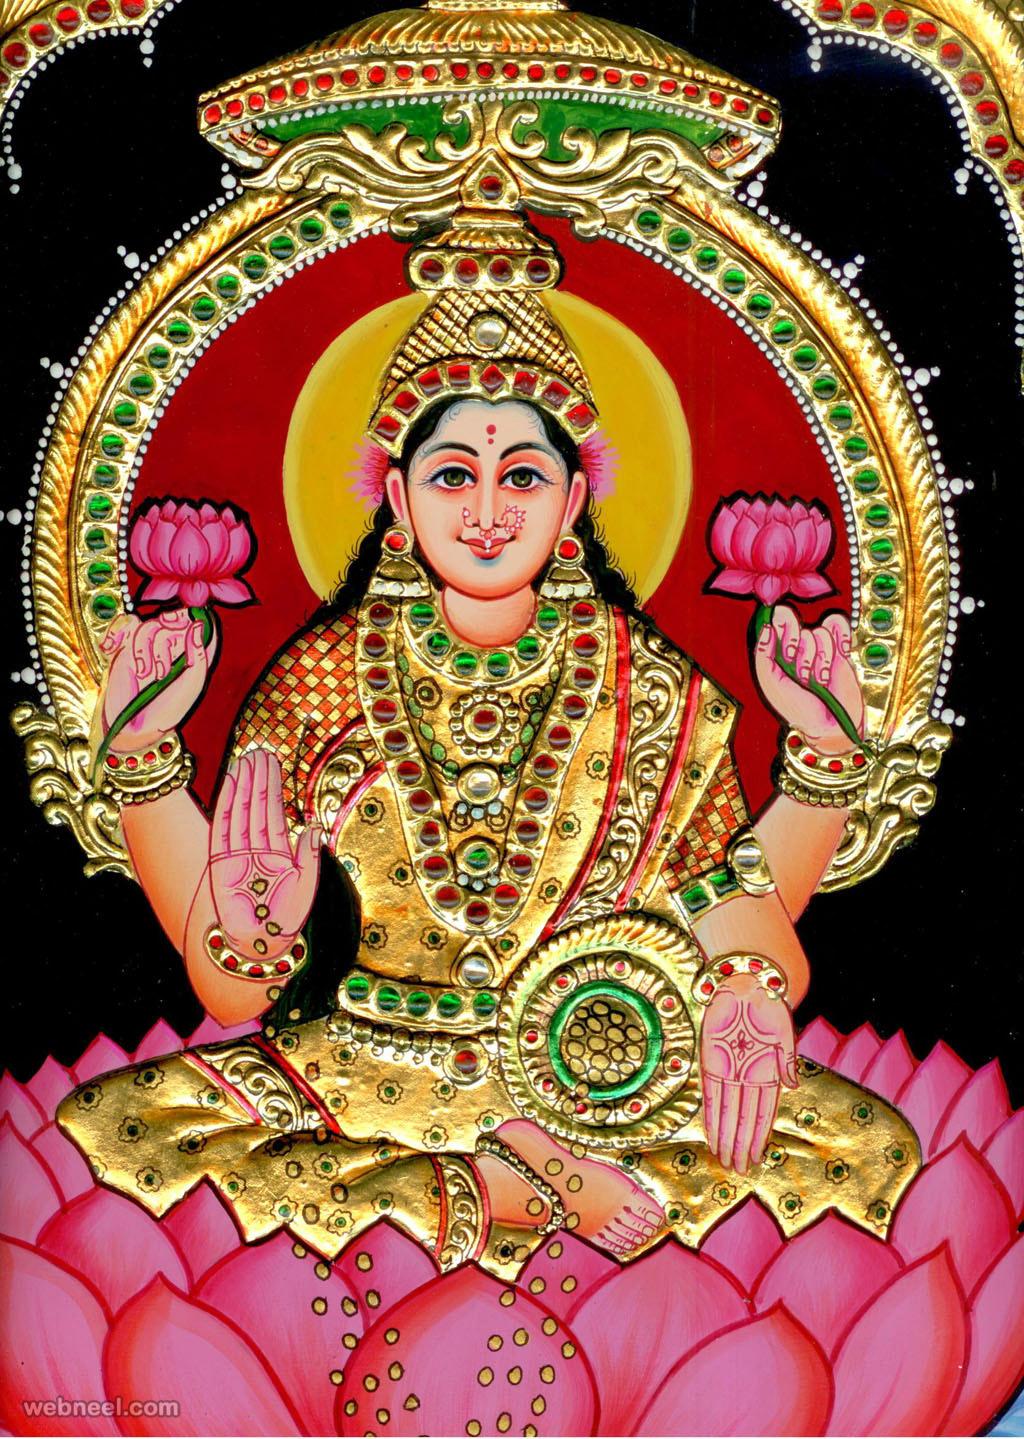 Rajput Wallpaper Hd Download Lakshmi Tanjore Painting 10